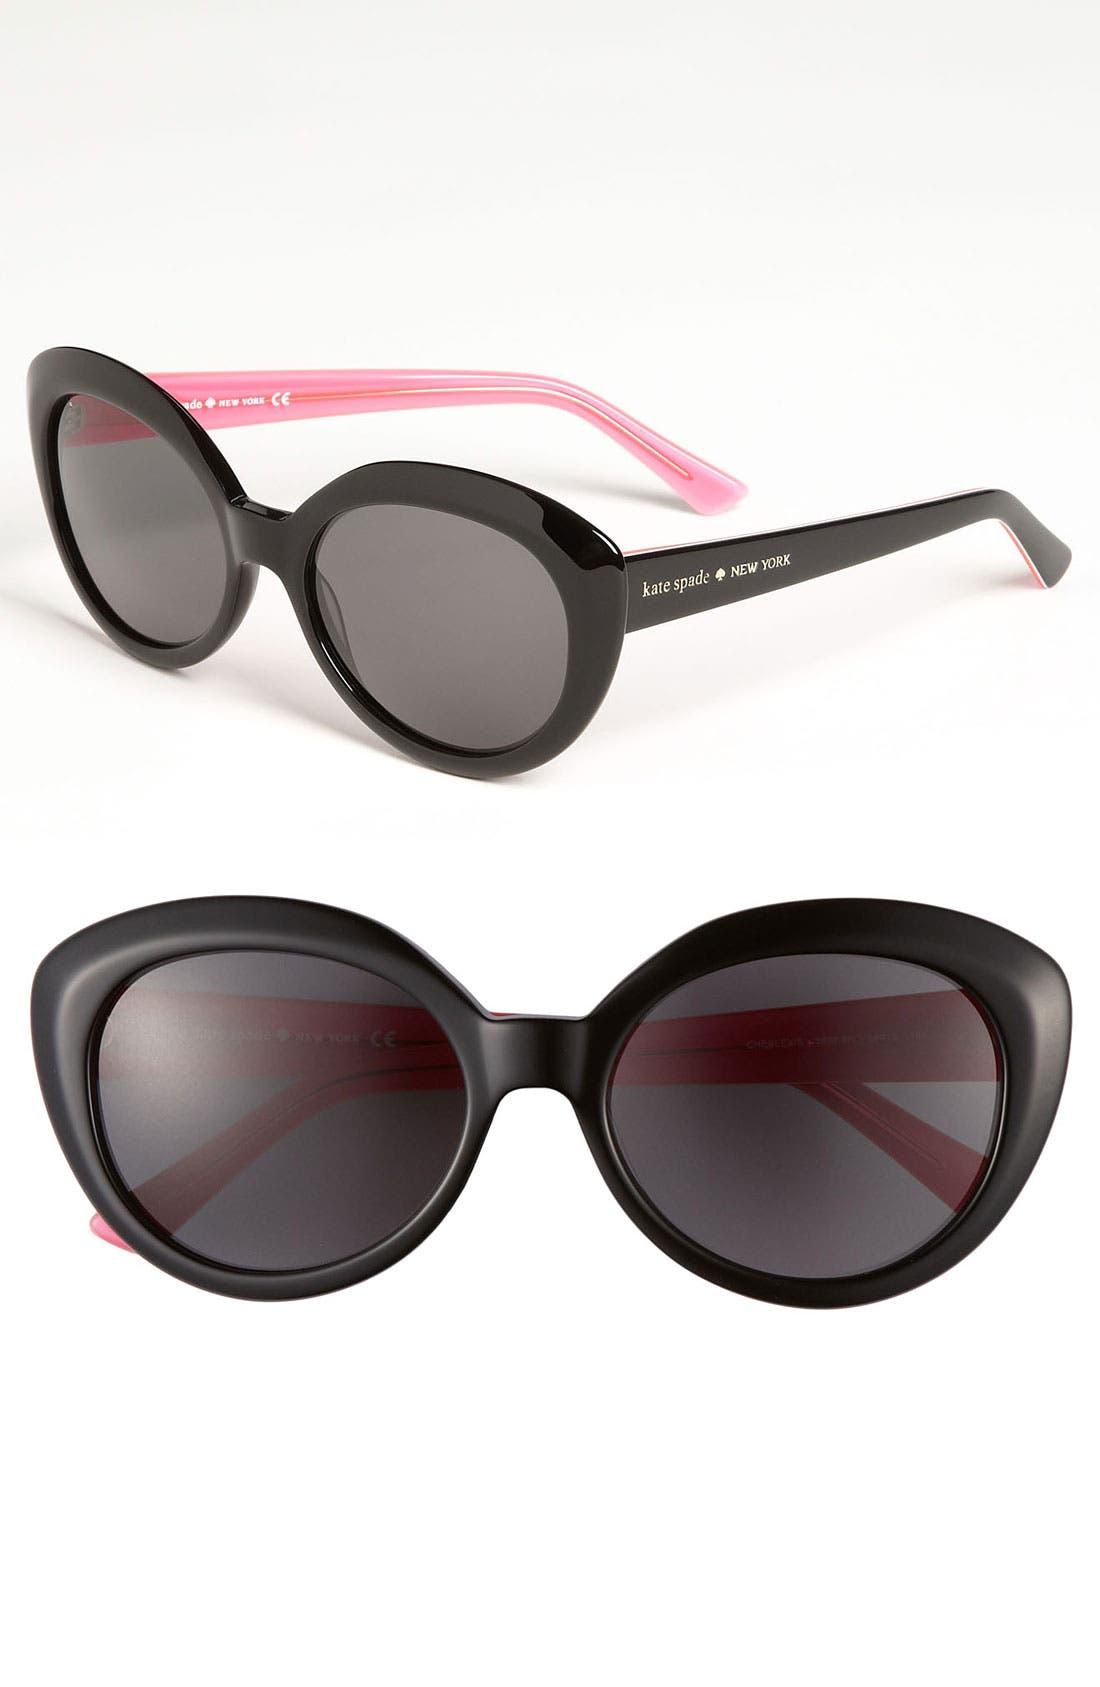 Main Image - kate spade new york cat's eye sunglasses